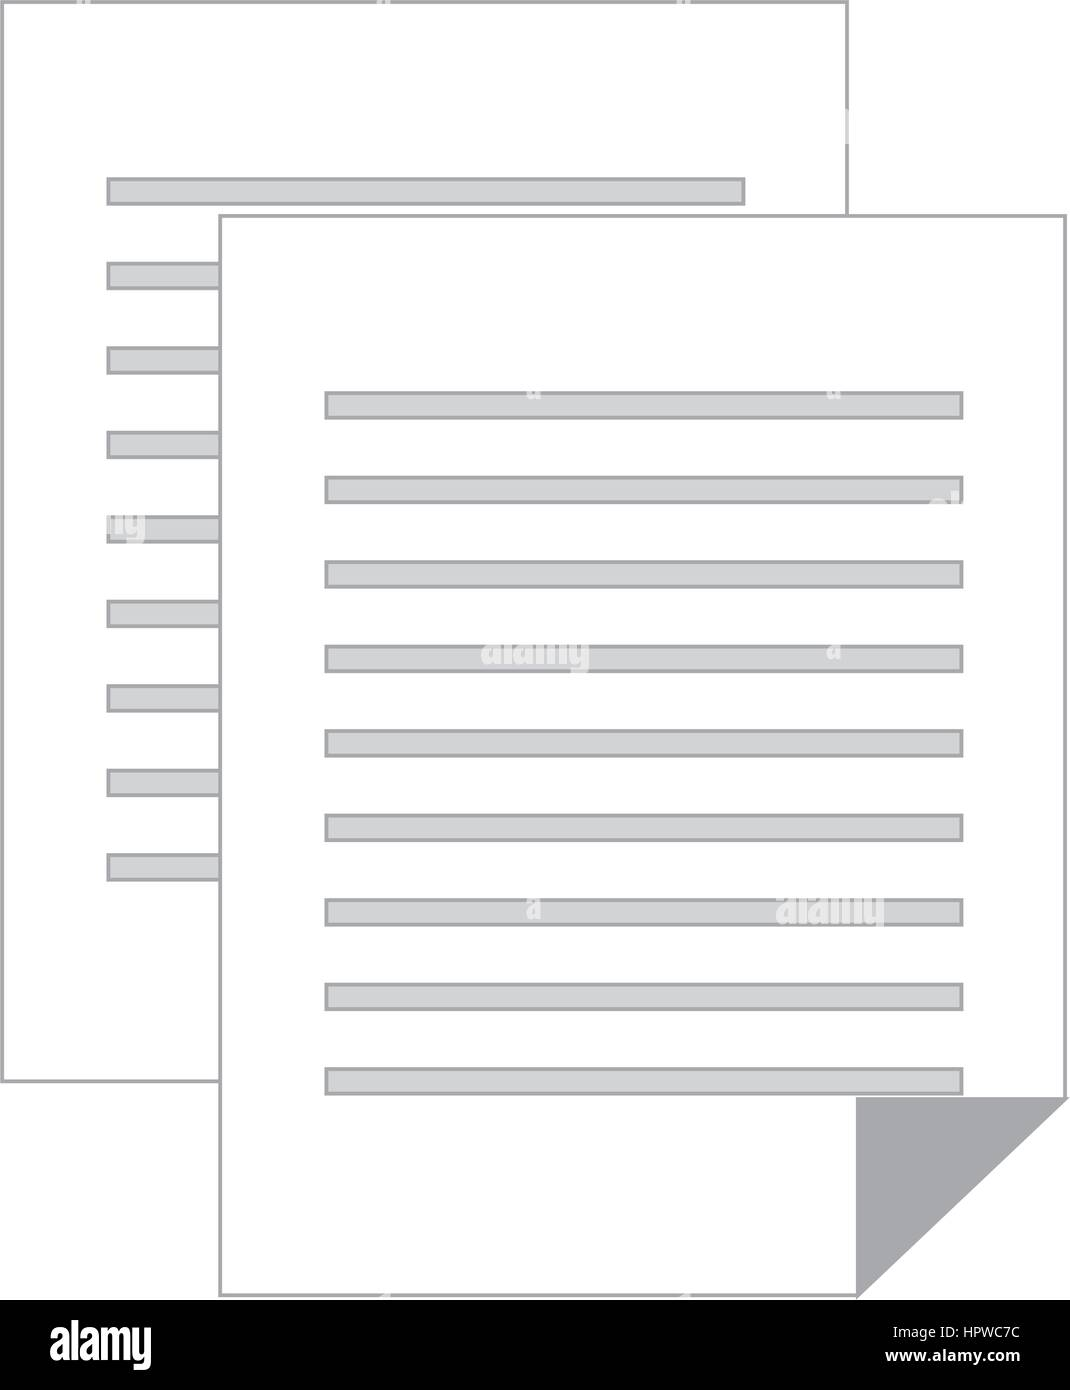 Graustufen-Silhouette mit Dokument-Datei Stockbild